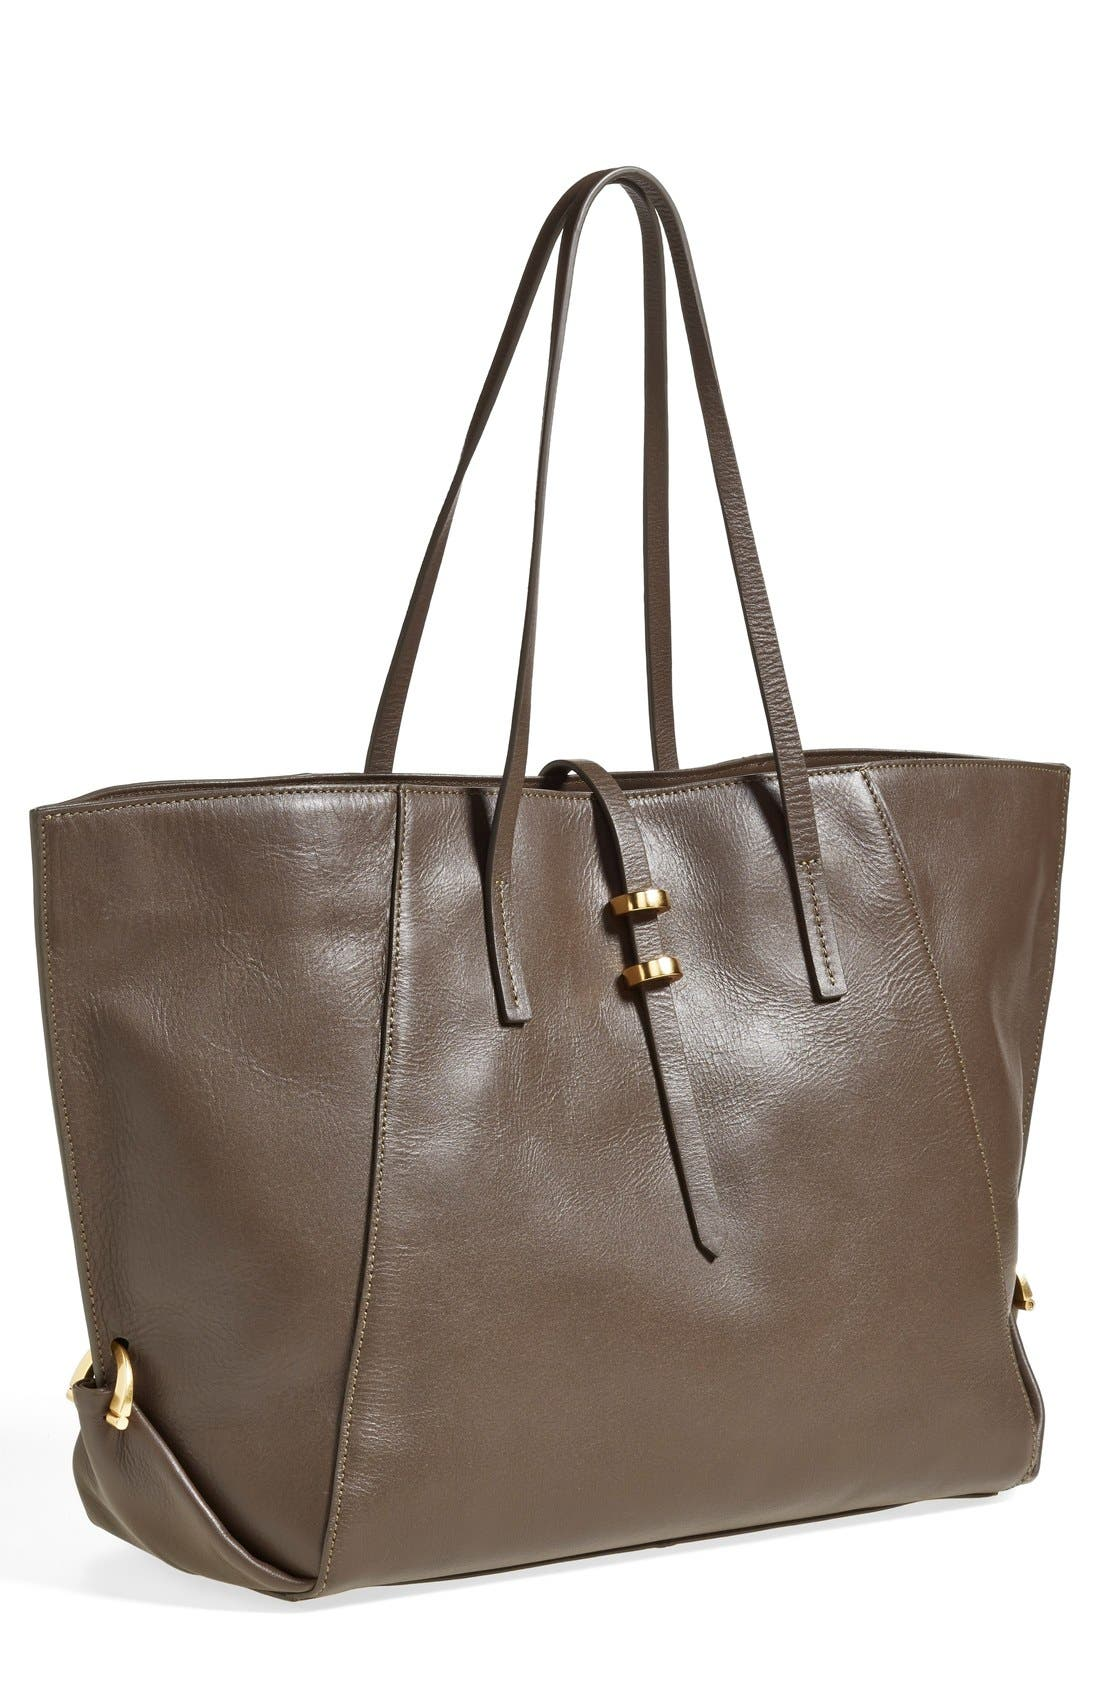 Main Image - ZAC Zac Posen 'Eartha' Leather Shopper